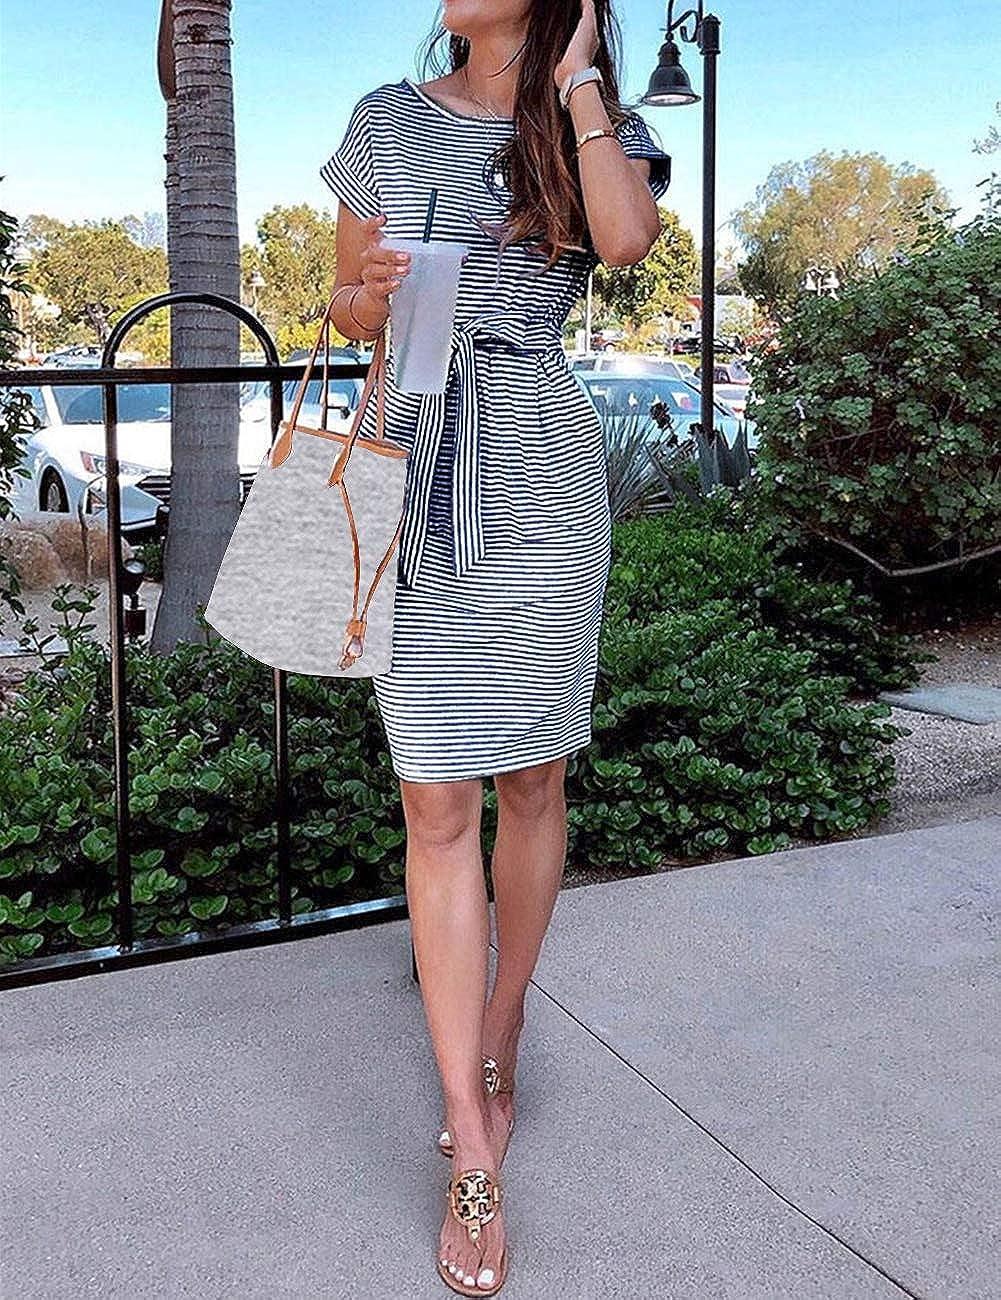 MEROKEETY Women's Summer Striped Short Sleeve T Shirt Dress Casual Tie Waist Midi Dress